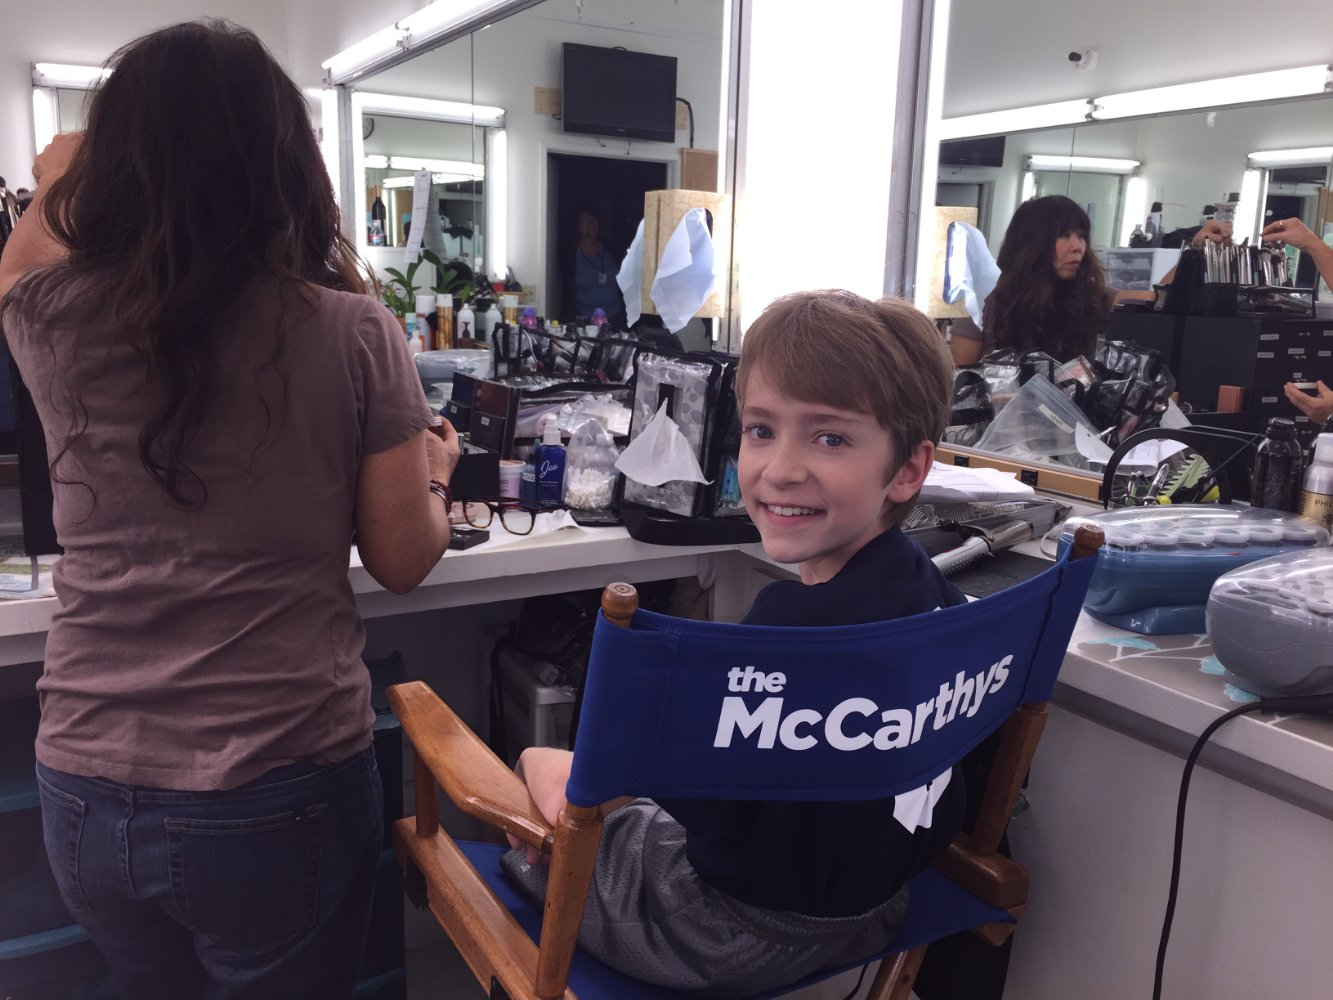 The McCarthys - Season 1